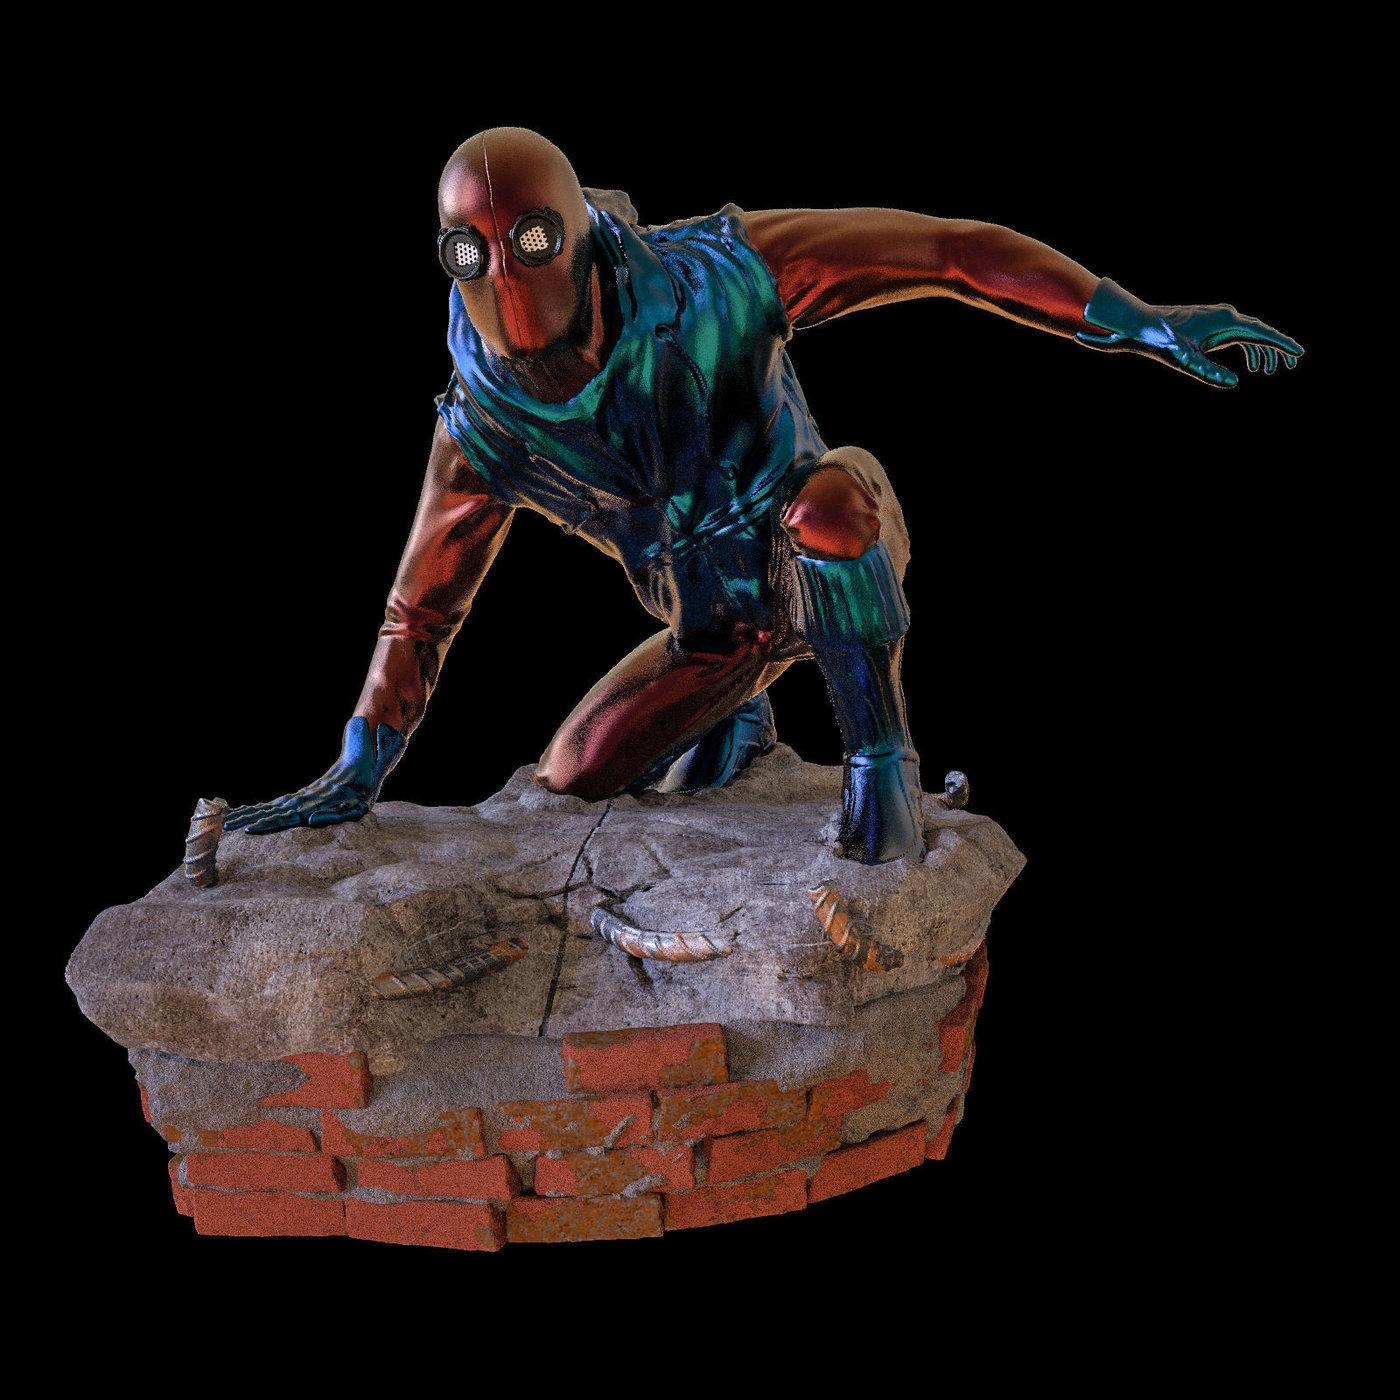 Spider-Man Homemade Suit